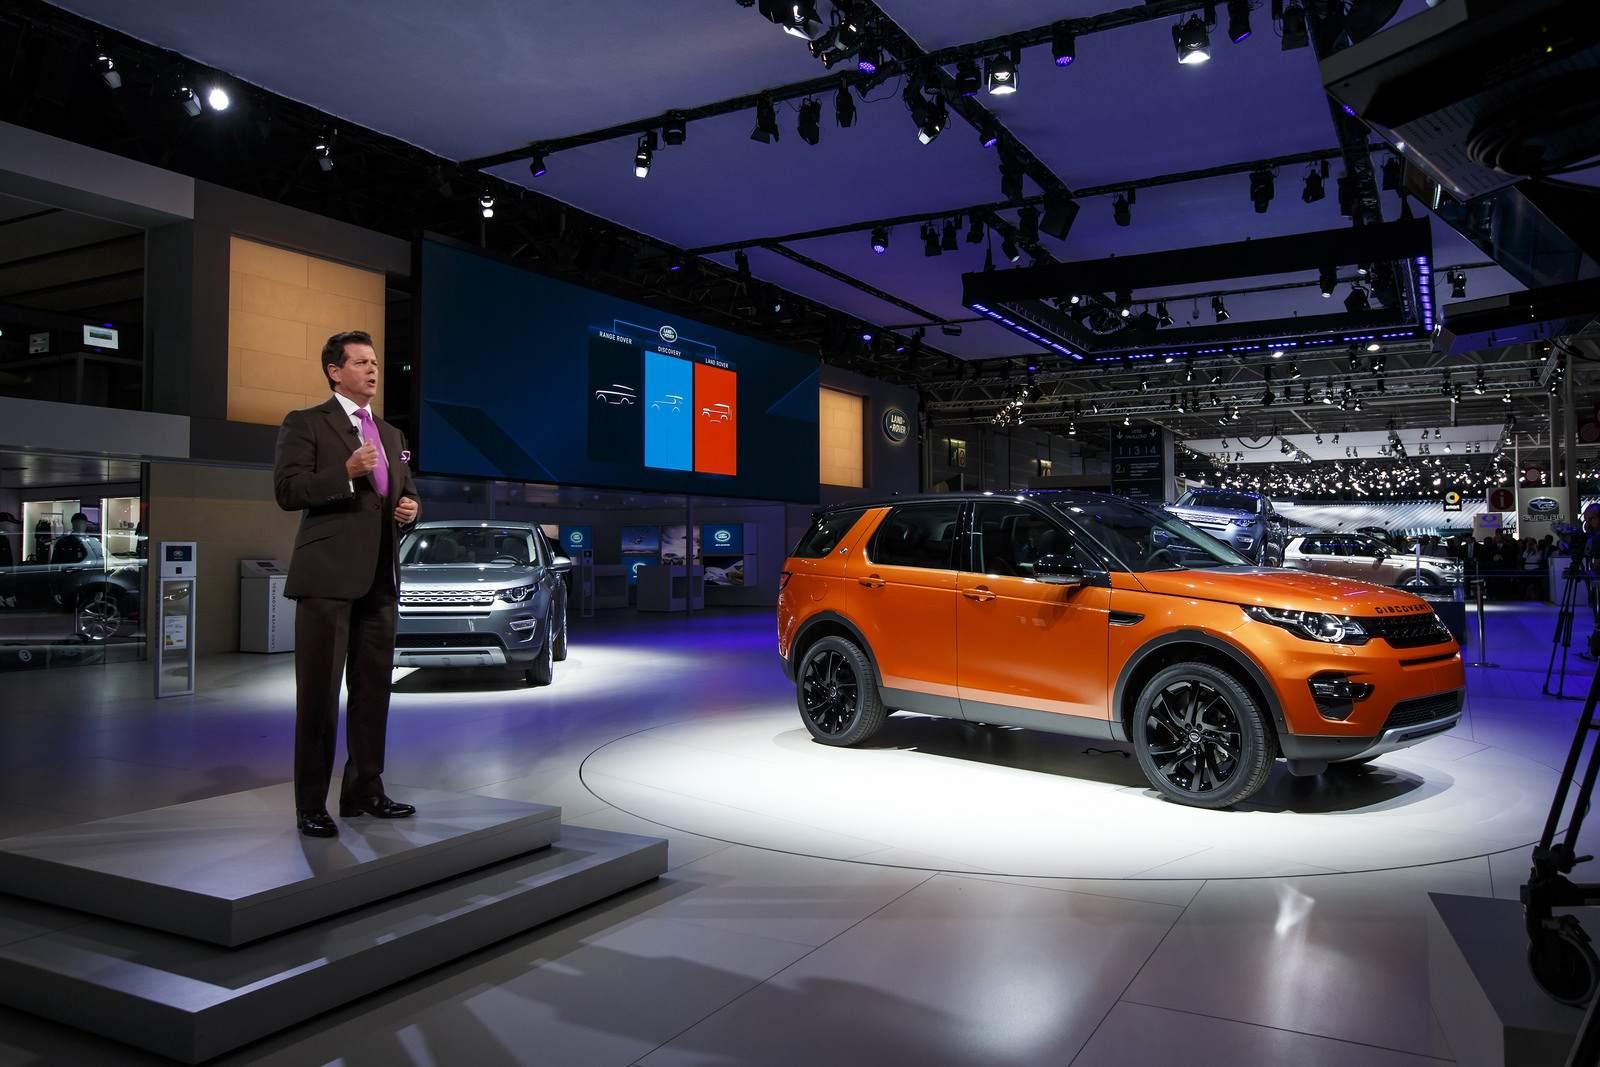 paris motor show5 Jaguar and Land Rover at Paris Auto Show 2014